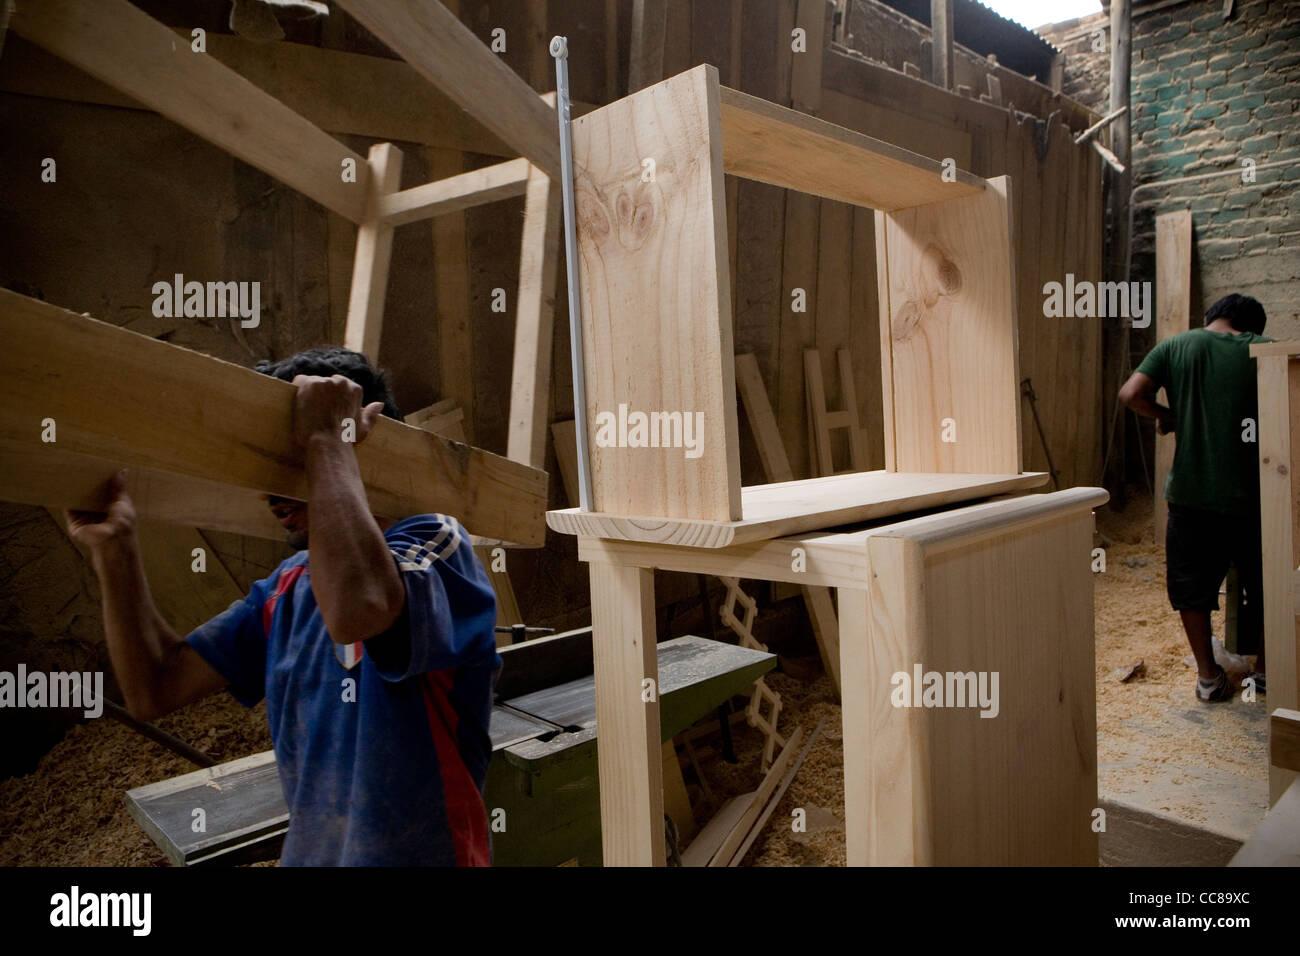 A Carpenter Works In A Woodworking Shop In Lima Peru South America Stock Photo Alamy